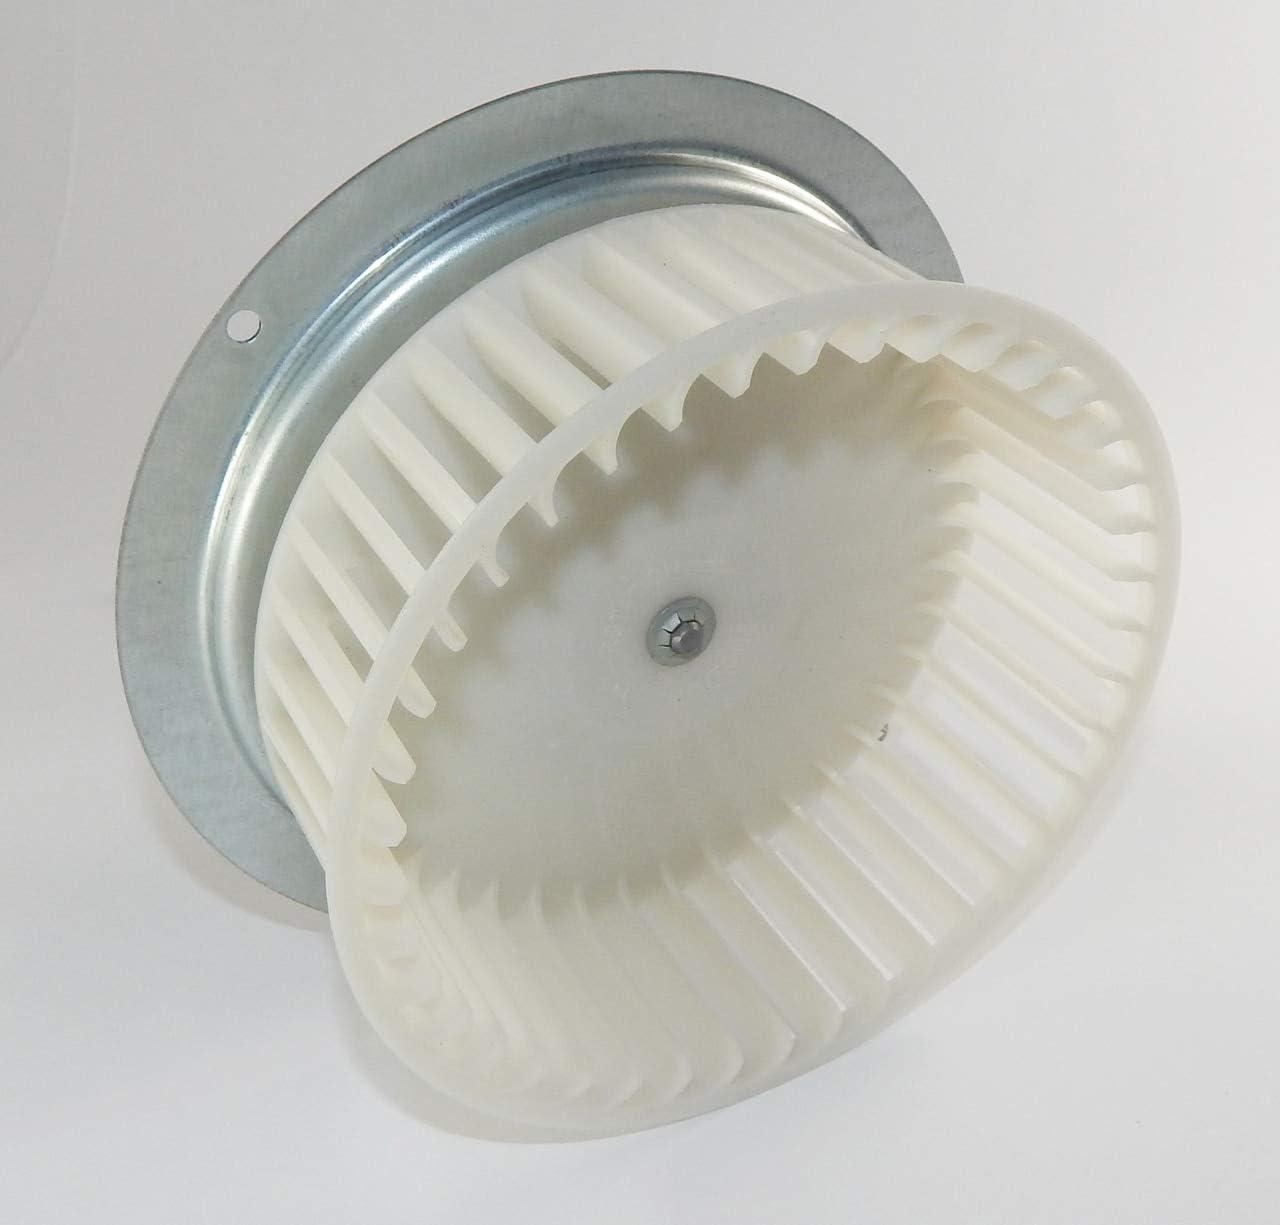 Assembly kit for QT80L 120V Nutone Fan Motor 86323000; 1180 RPM 0.61 amps